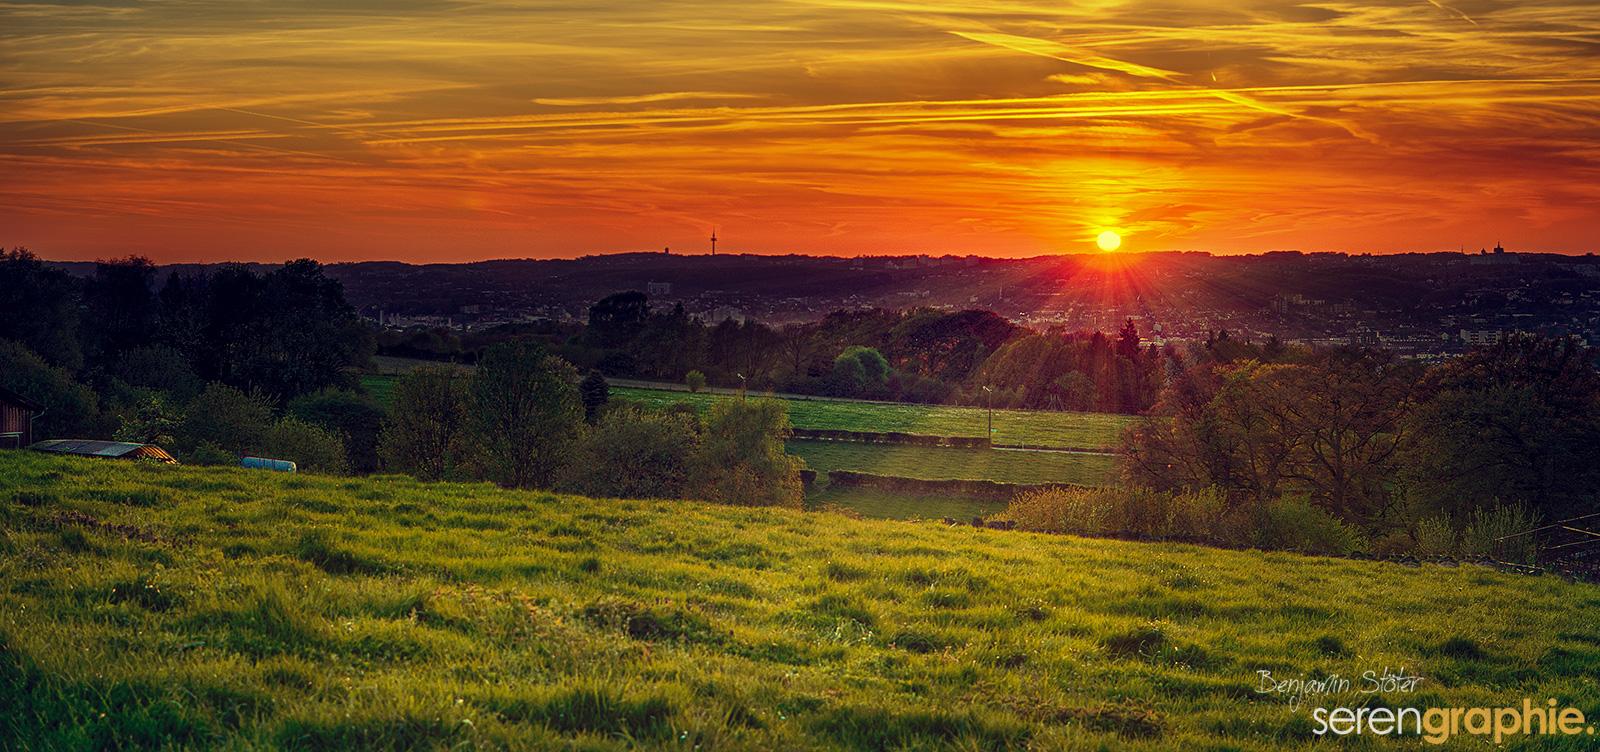 Sonnenuntergang über Wuppertal